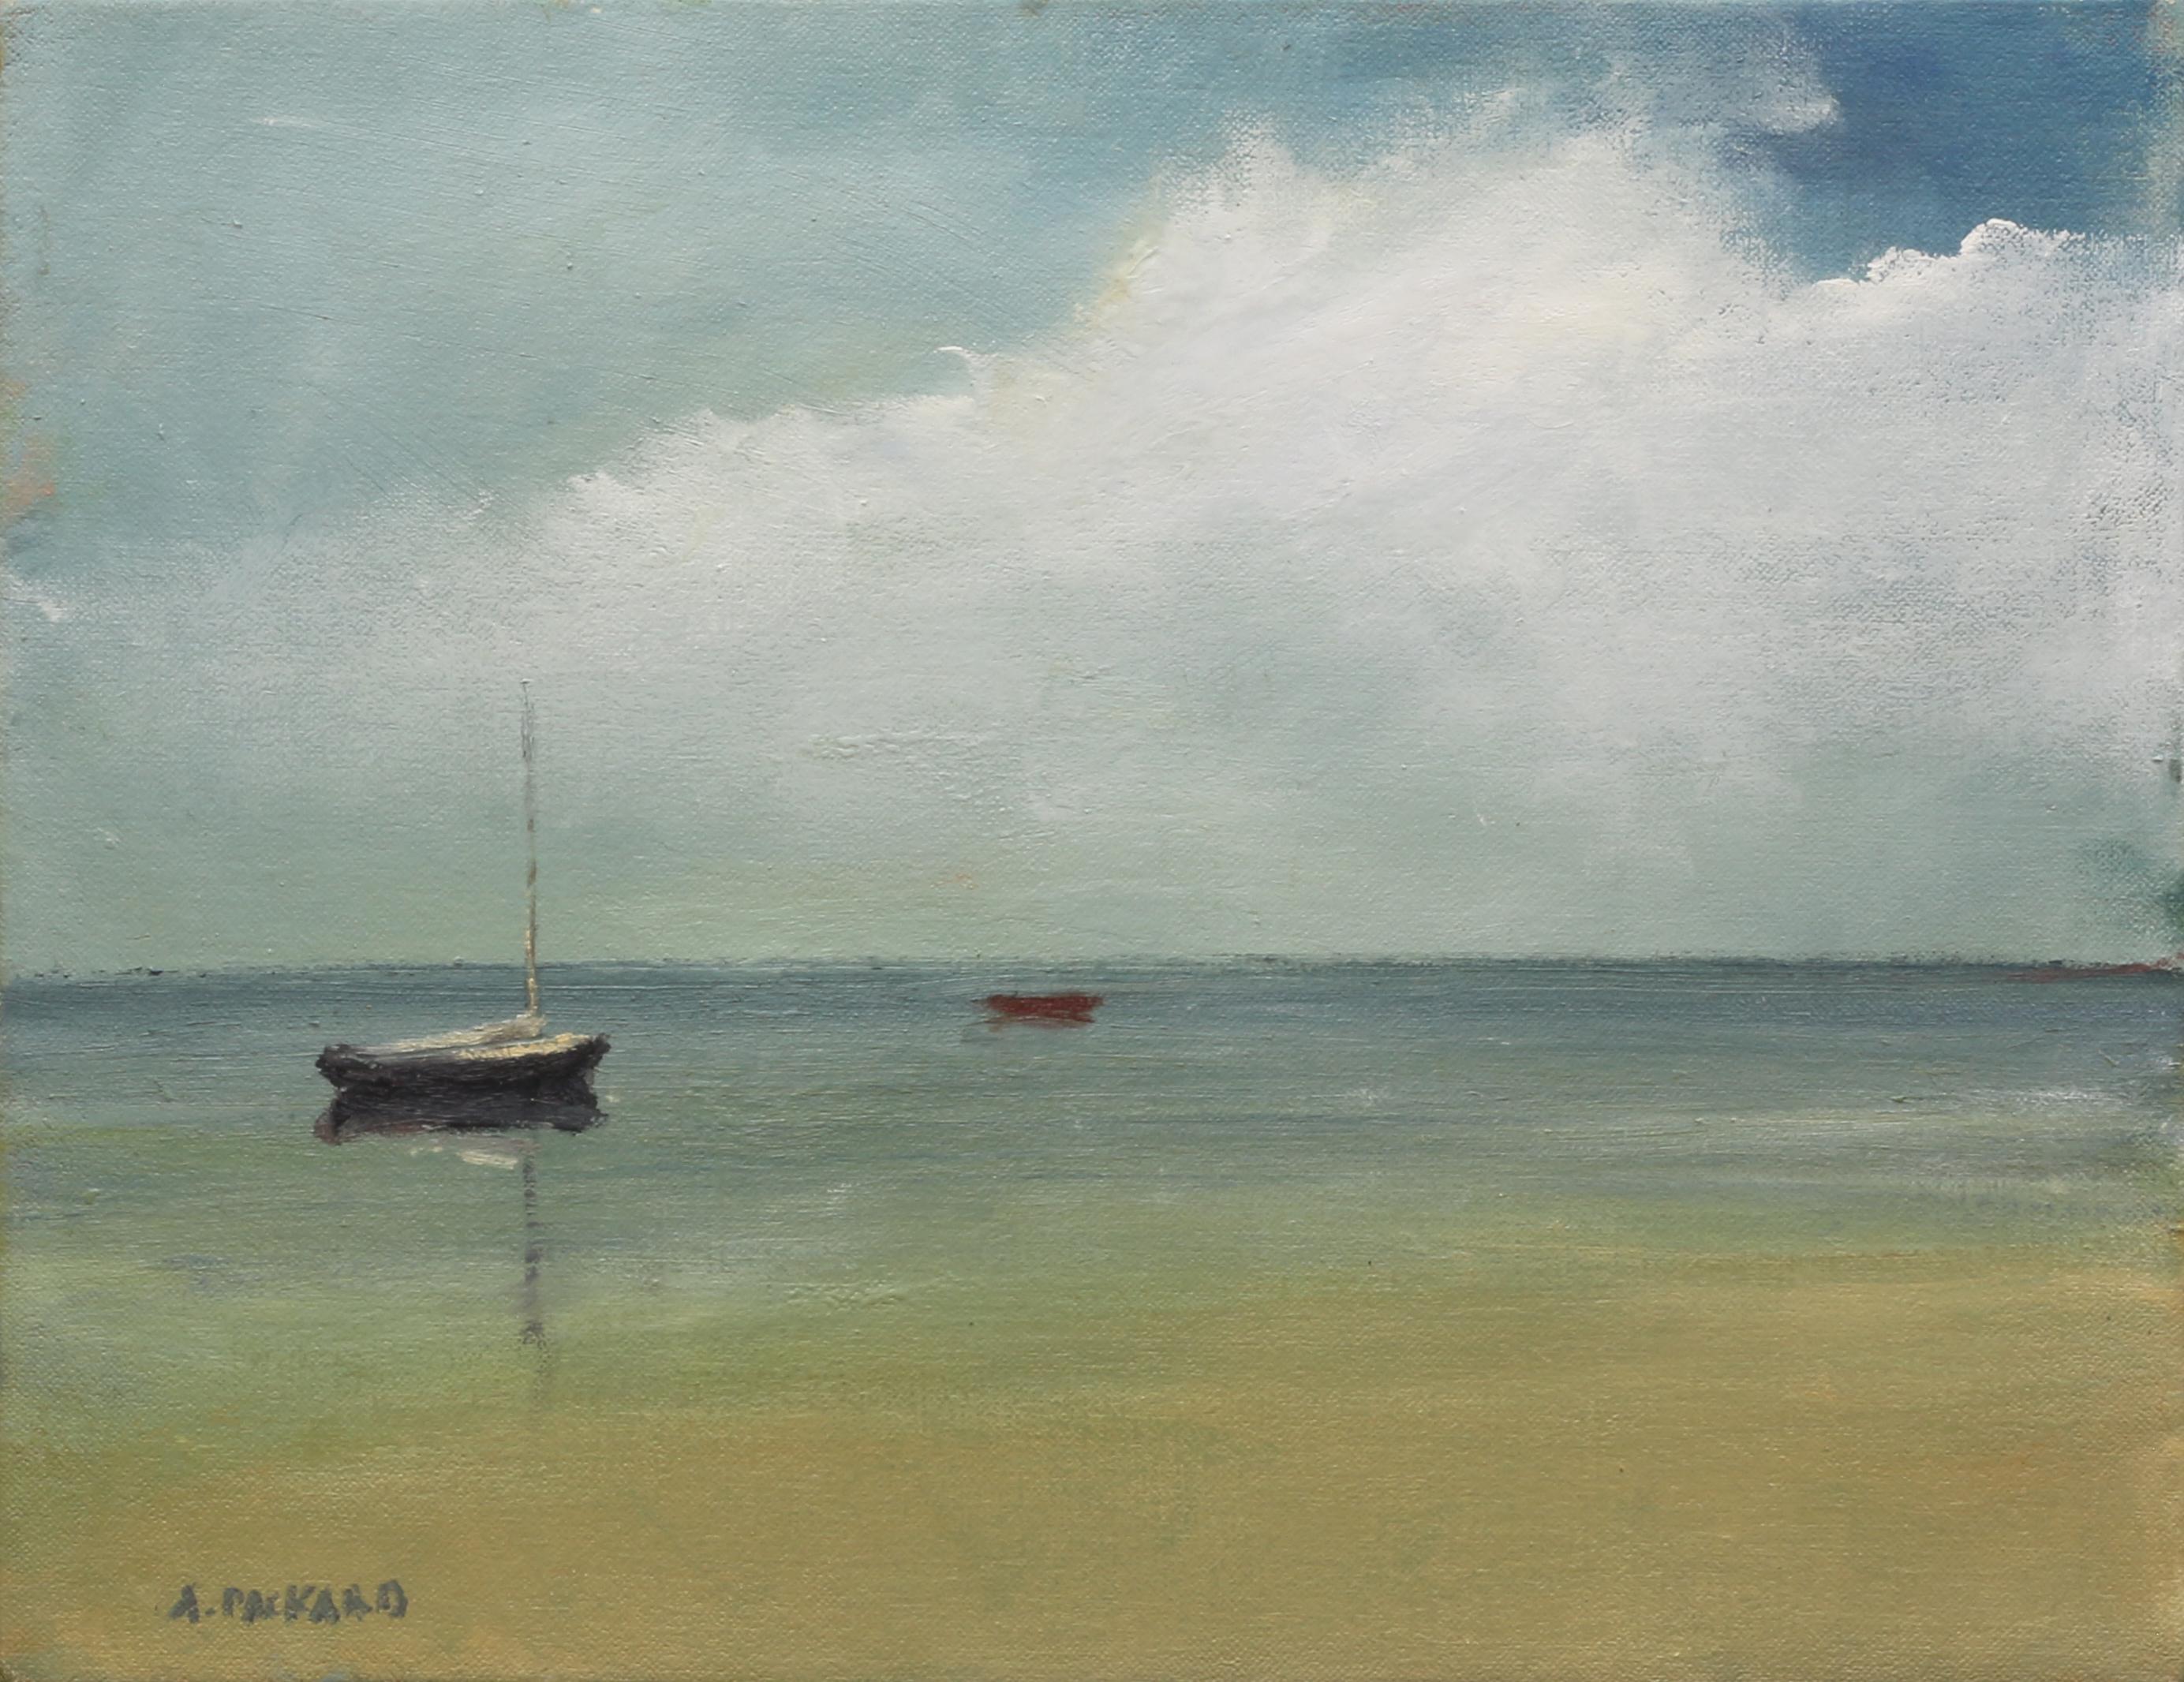 Anne Packard - Red Dory, Blue Sail